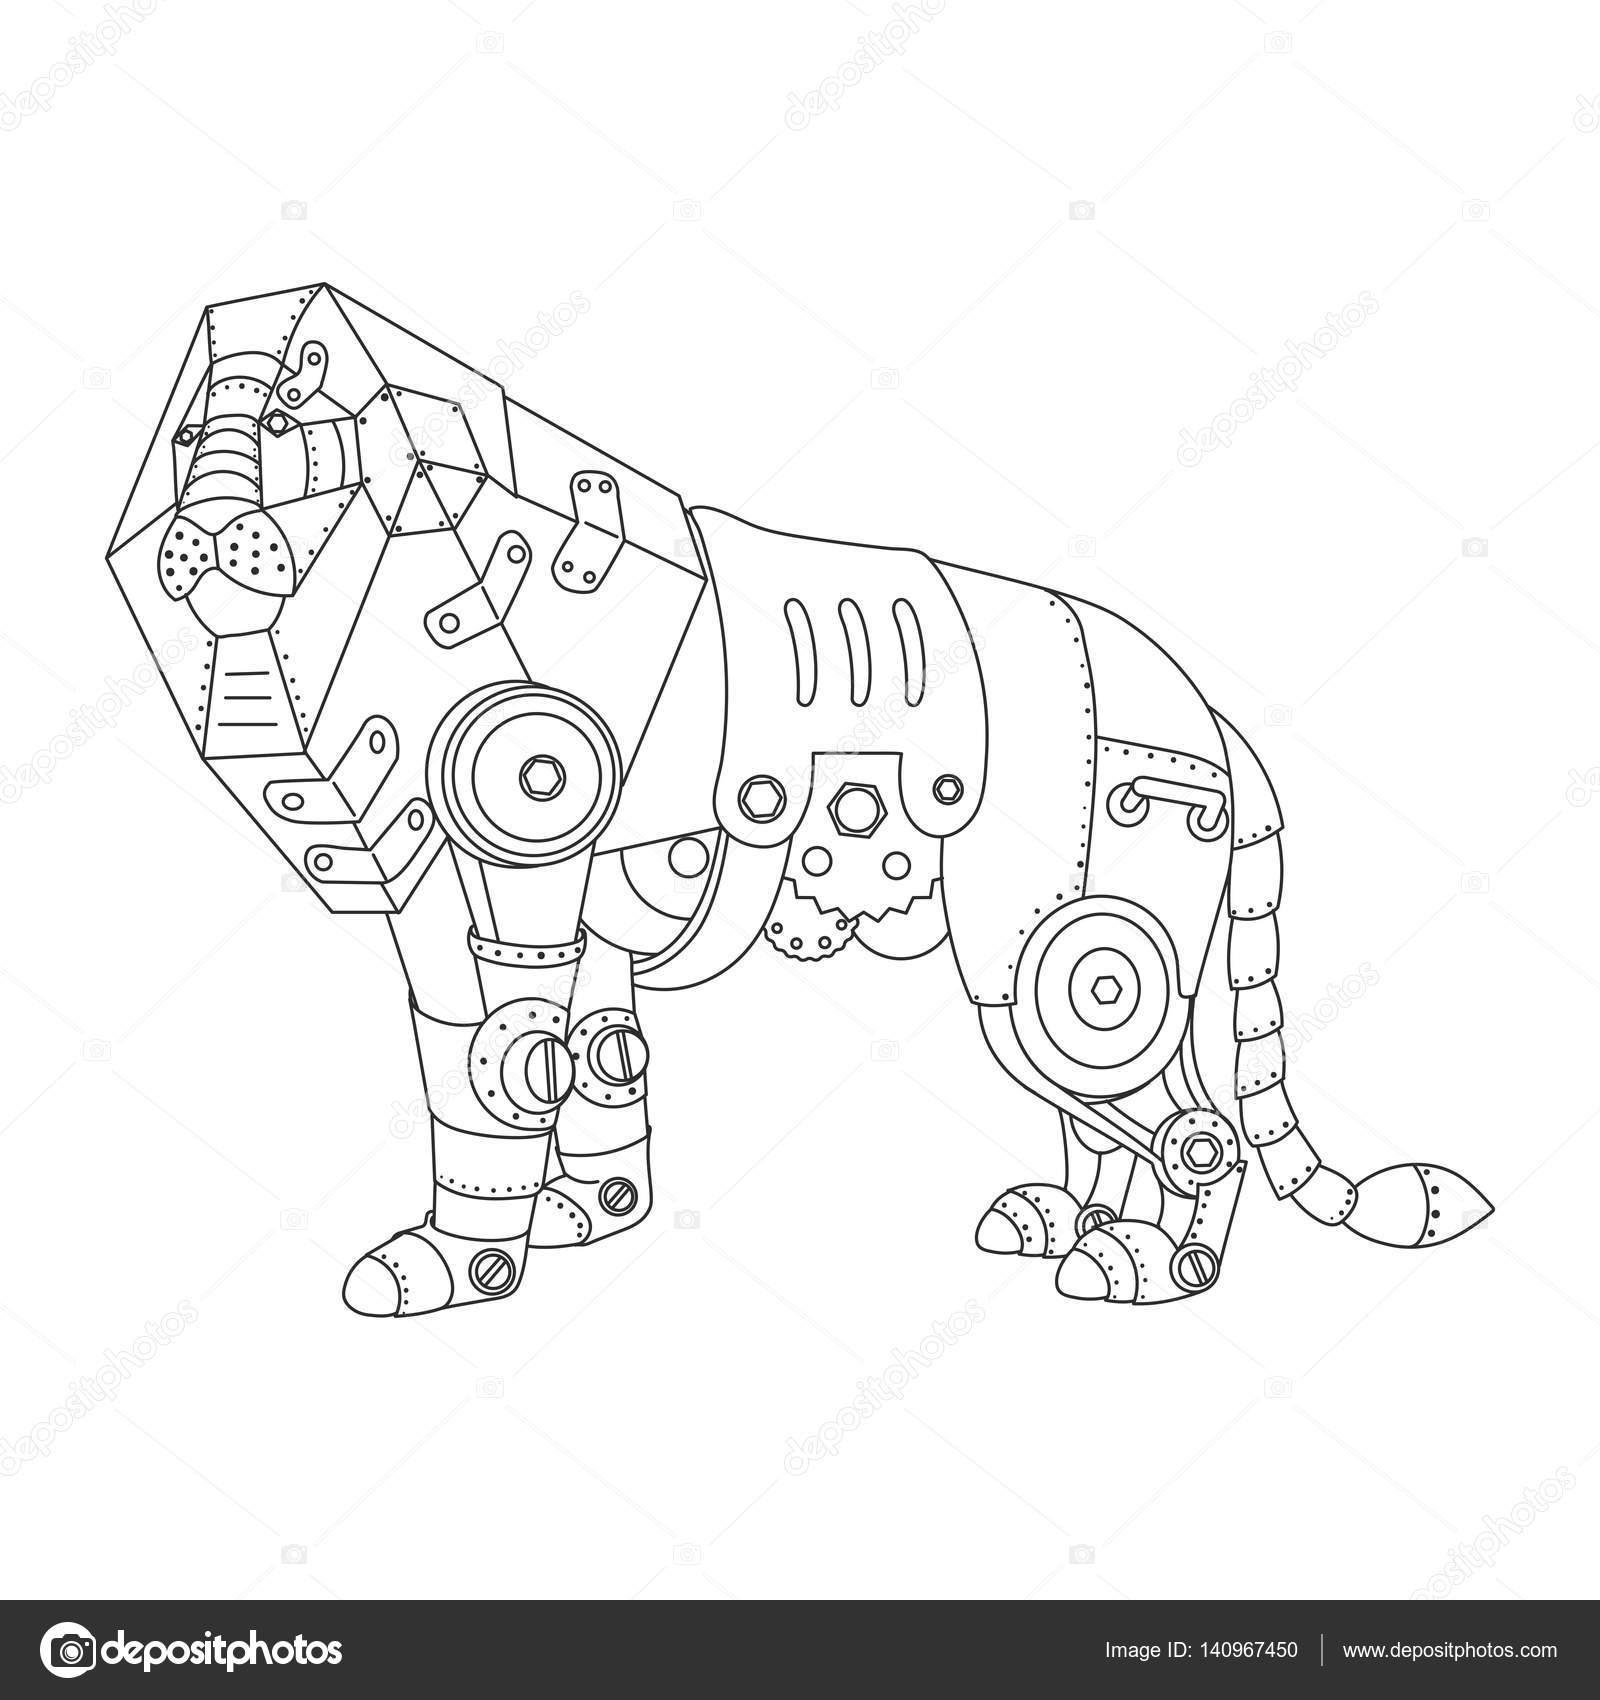 León de estilo Steampunk para colorear vector libro — Vector de ...